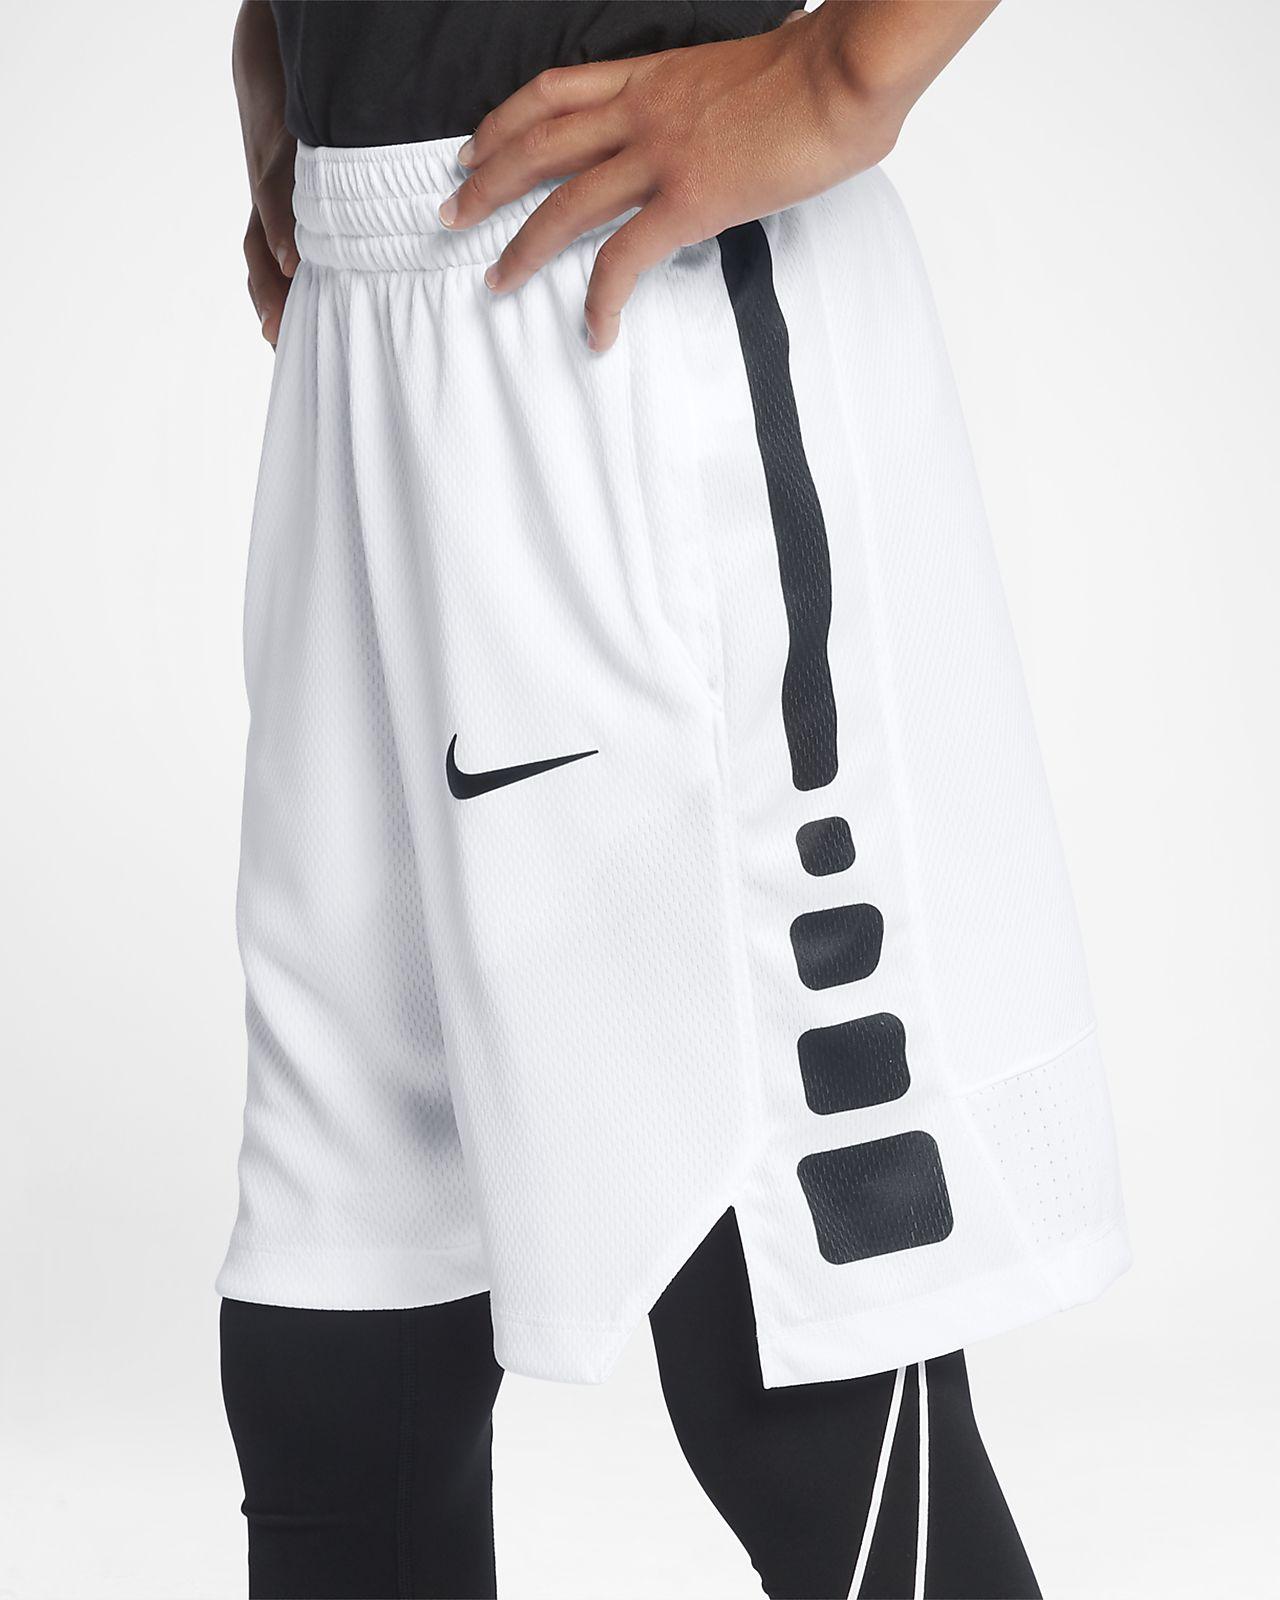 NIKE Boys Basketball Short Jordan Medium Polyester Black